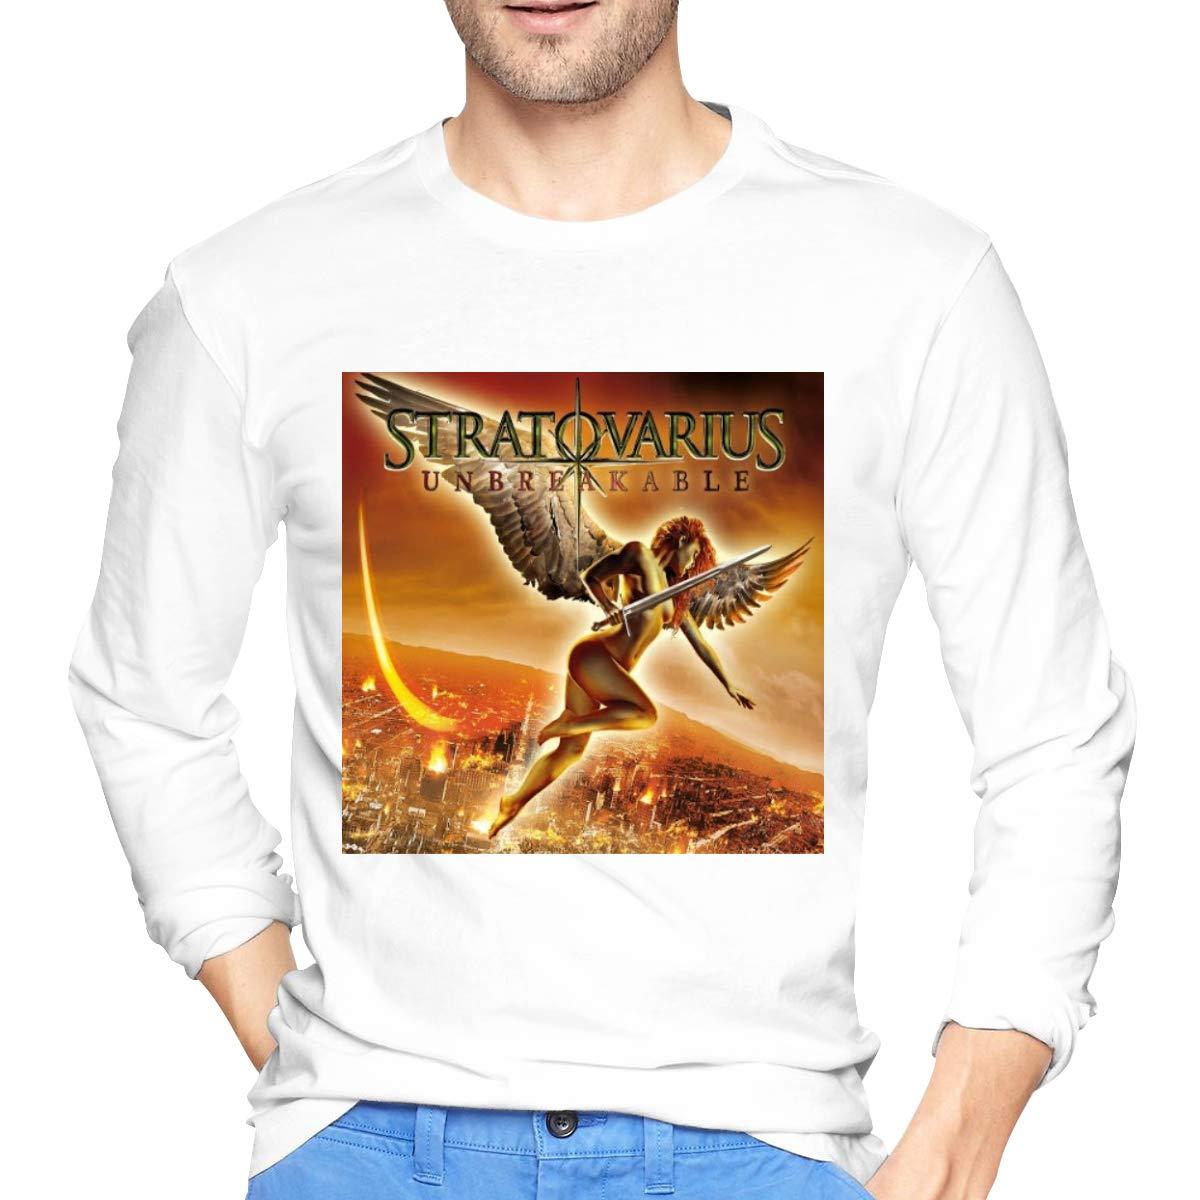 Lihehen Man Stratovarius Simple Casual Round Neck T Shirt S